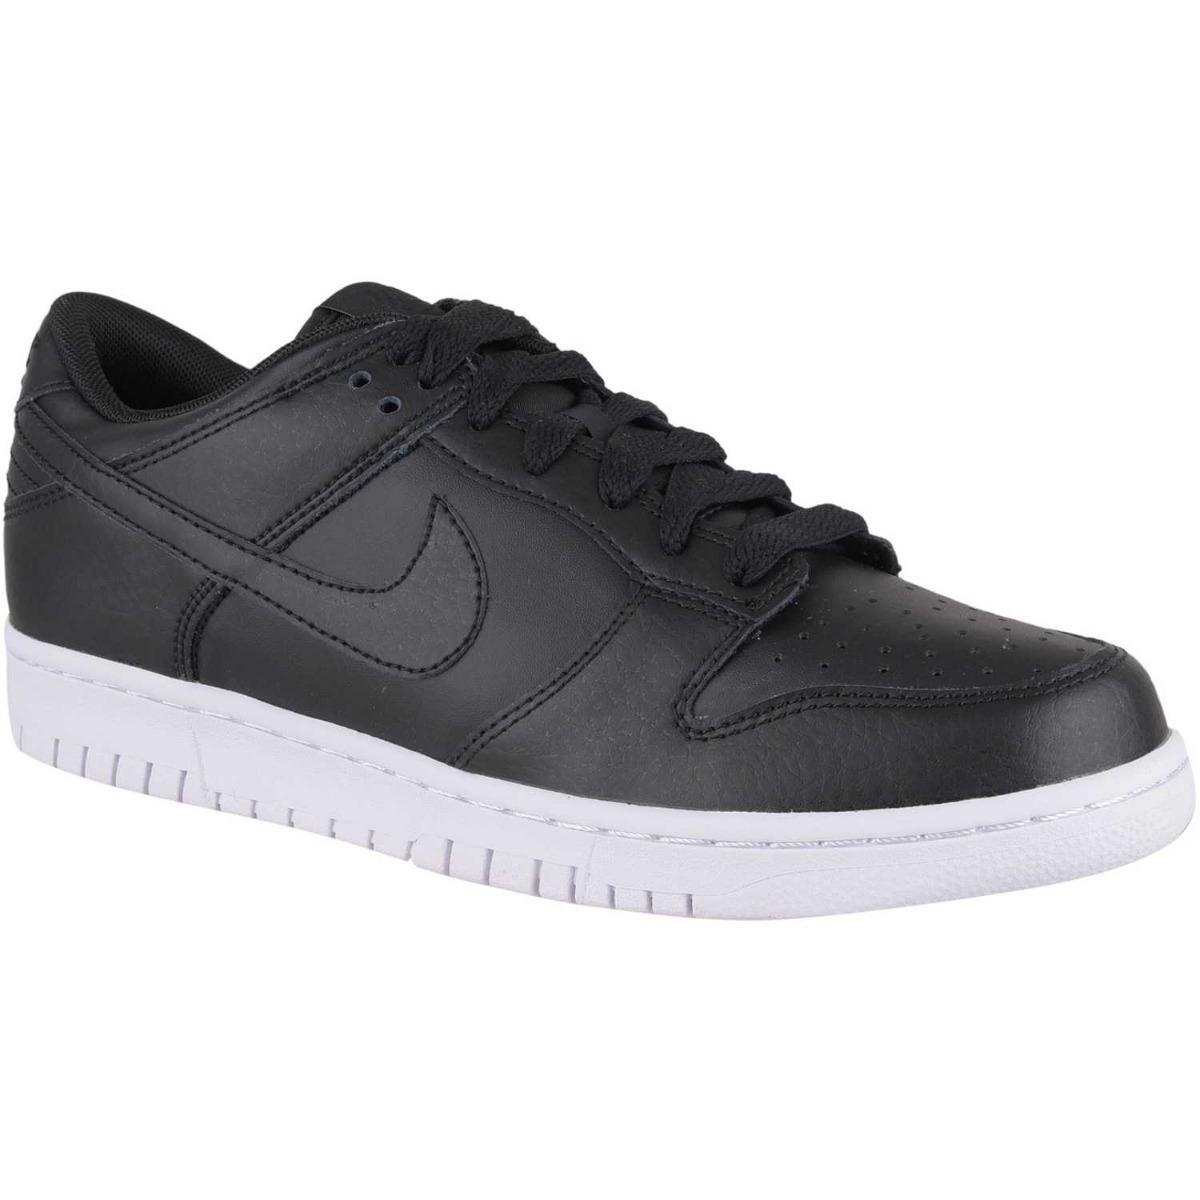 Zapatillas De Hombre Nike Dunk Low Original Lisel Store - S  409 79217136f2b